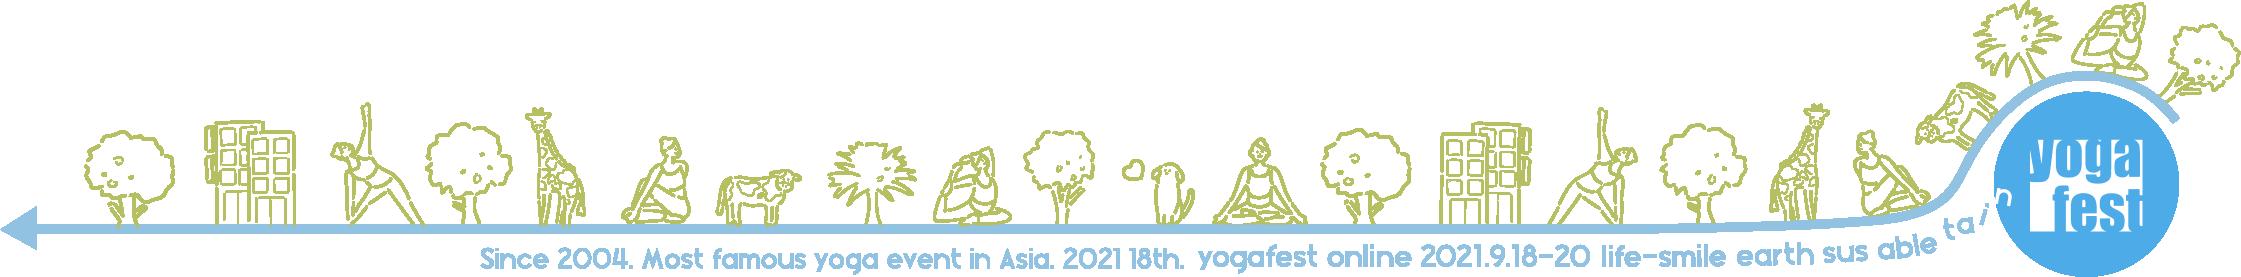 Yogafest ONLINE 2021